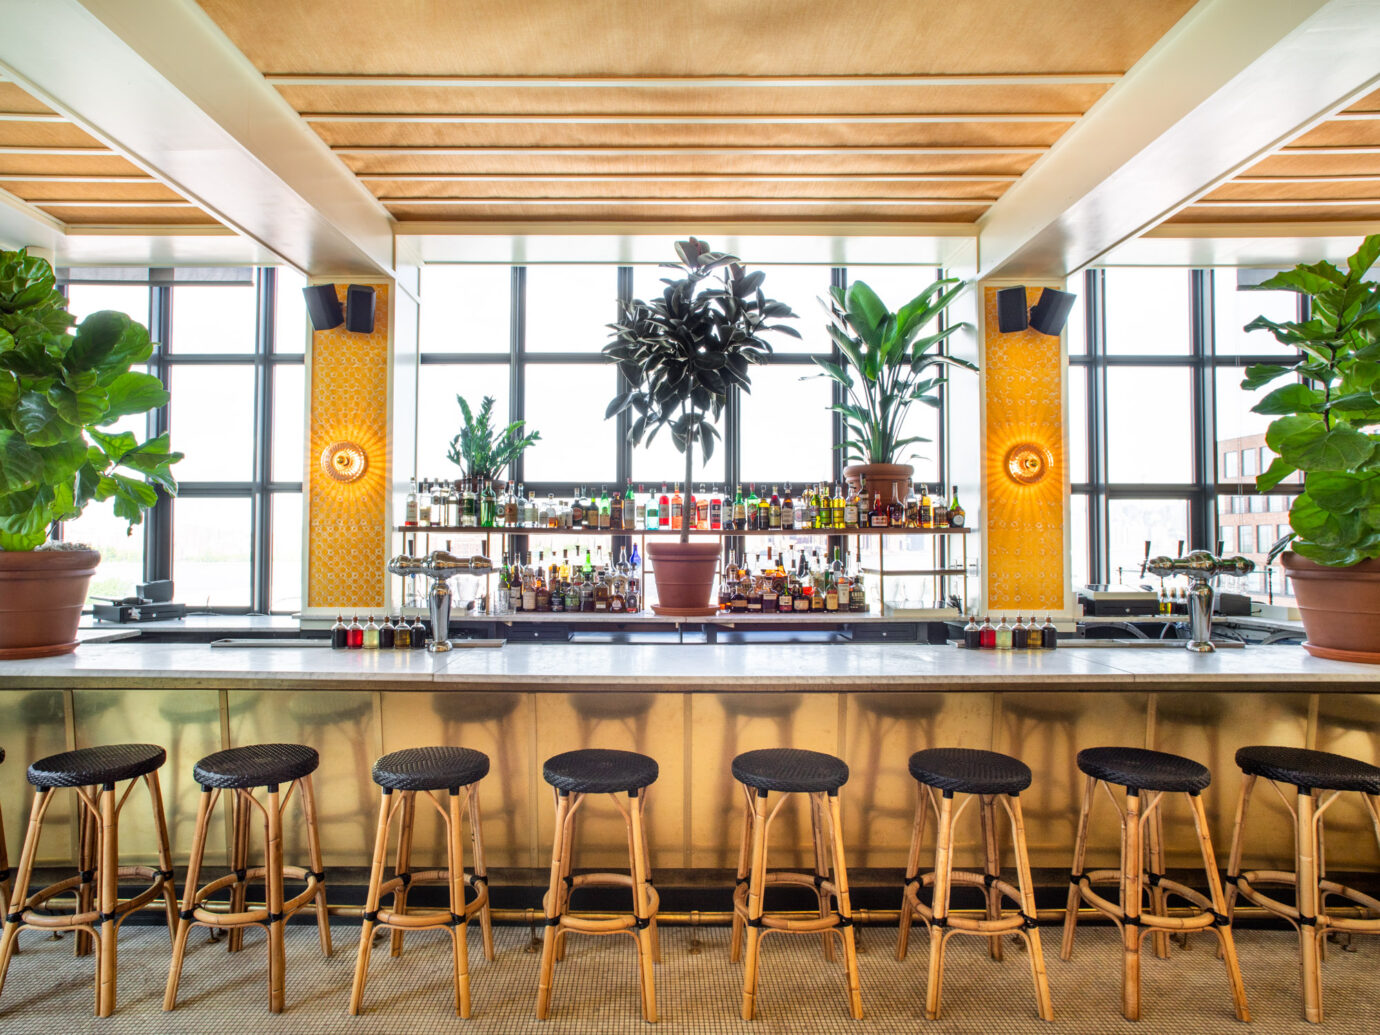 Lemon's Bar at the Wythe Hotel